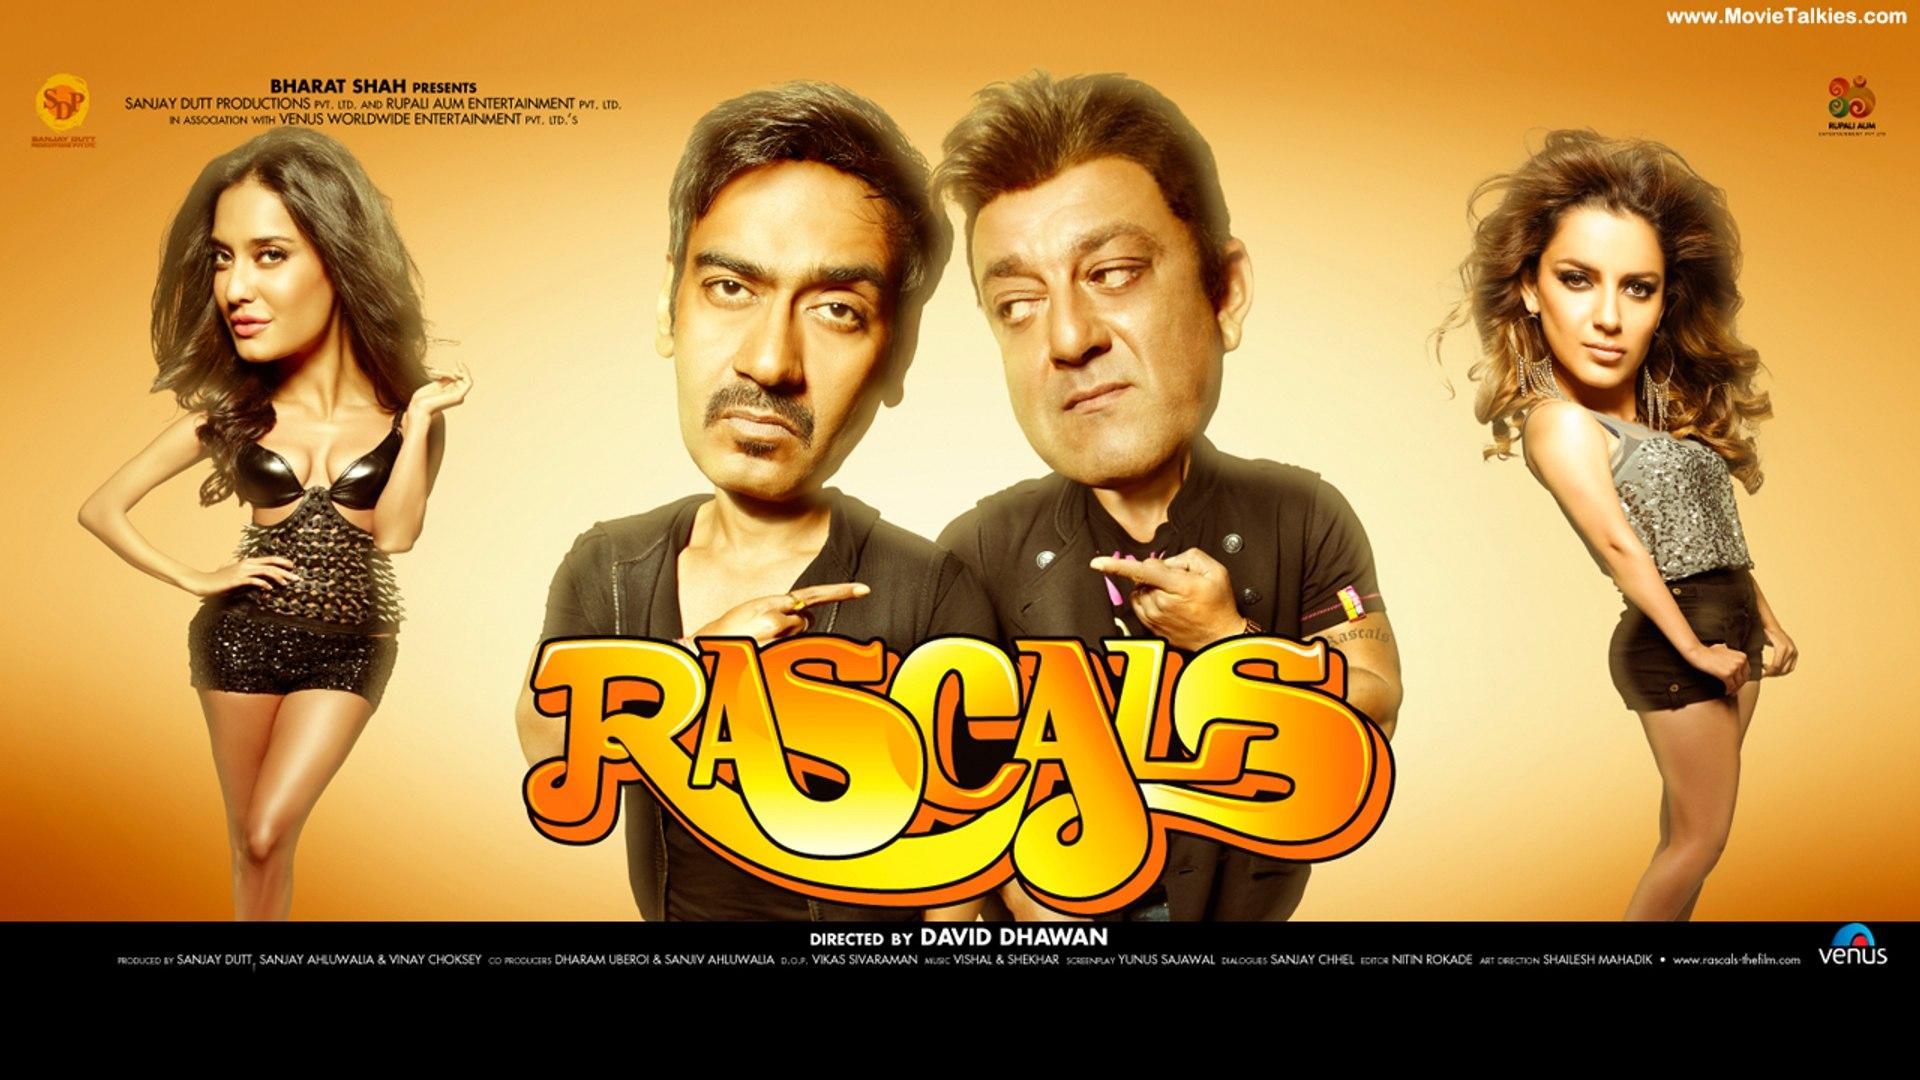 Rascals  Hindi Movies Full Movie  ,Ajay Devgan Full Movies  Latest Bollywood Full Movies PART 02